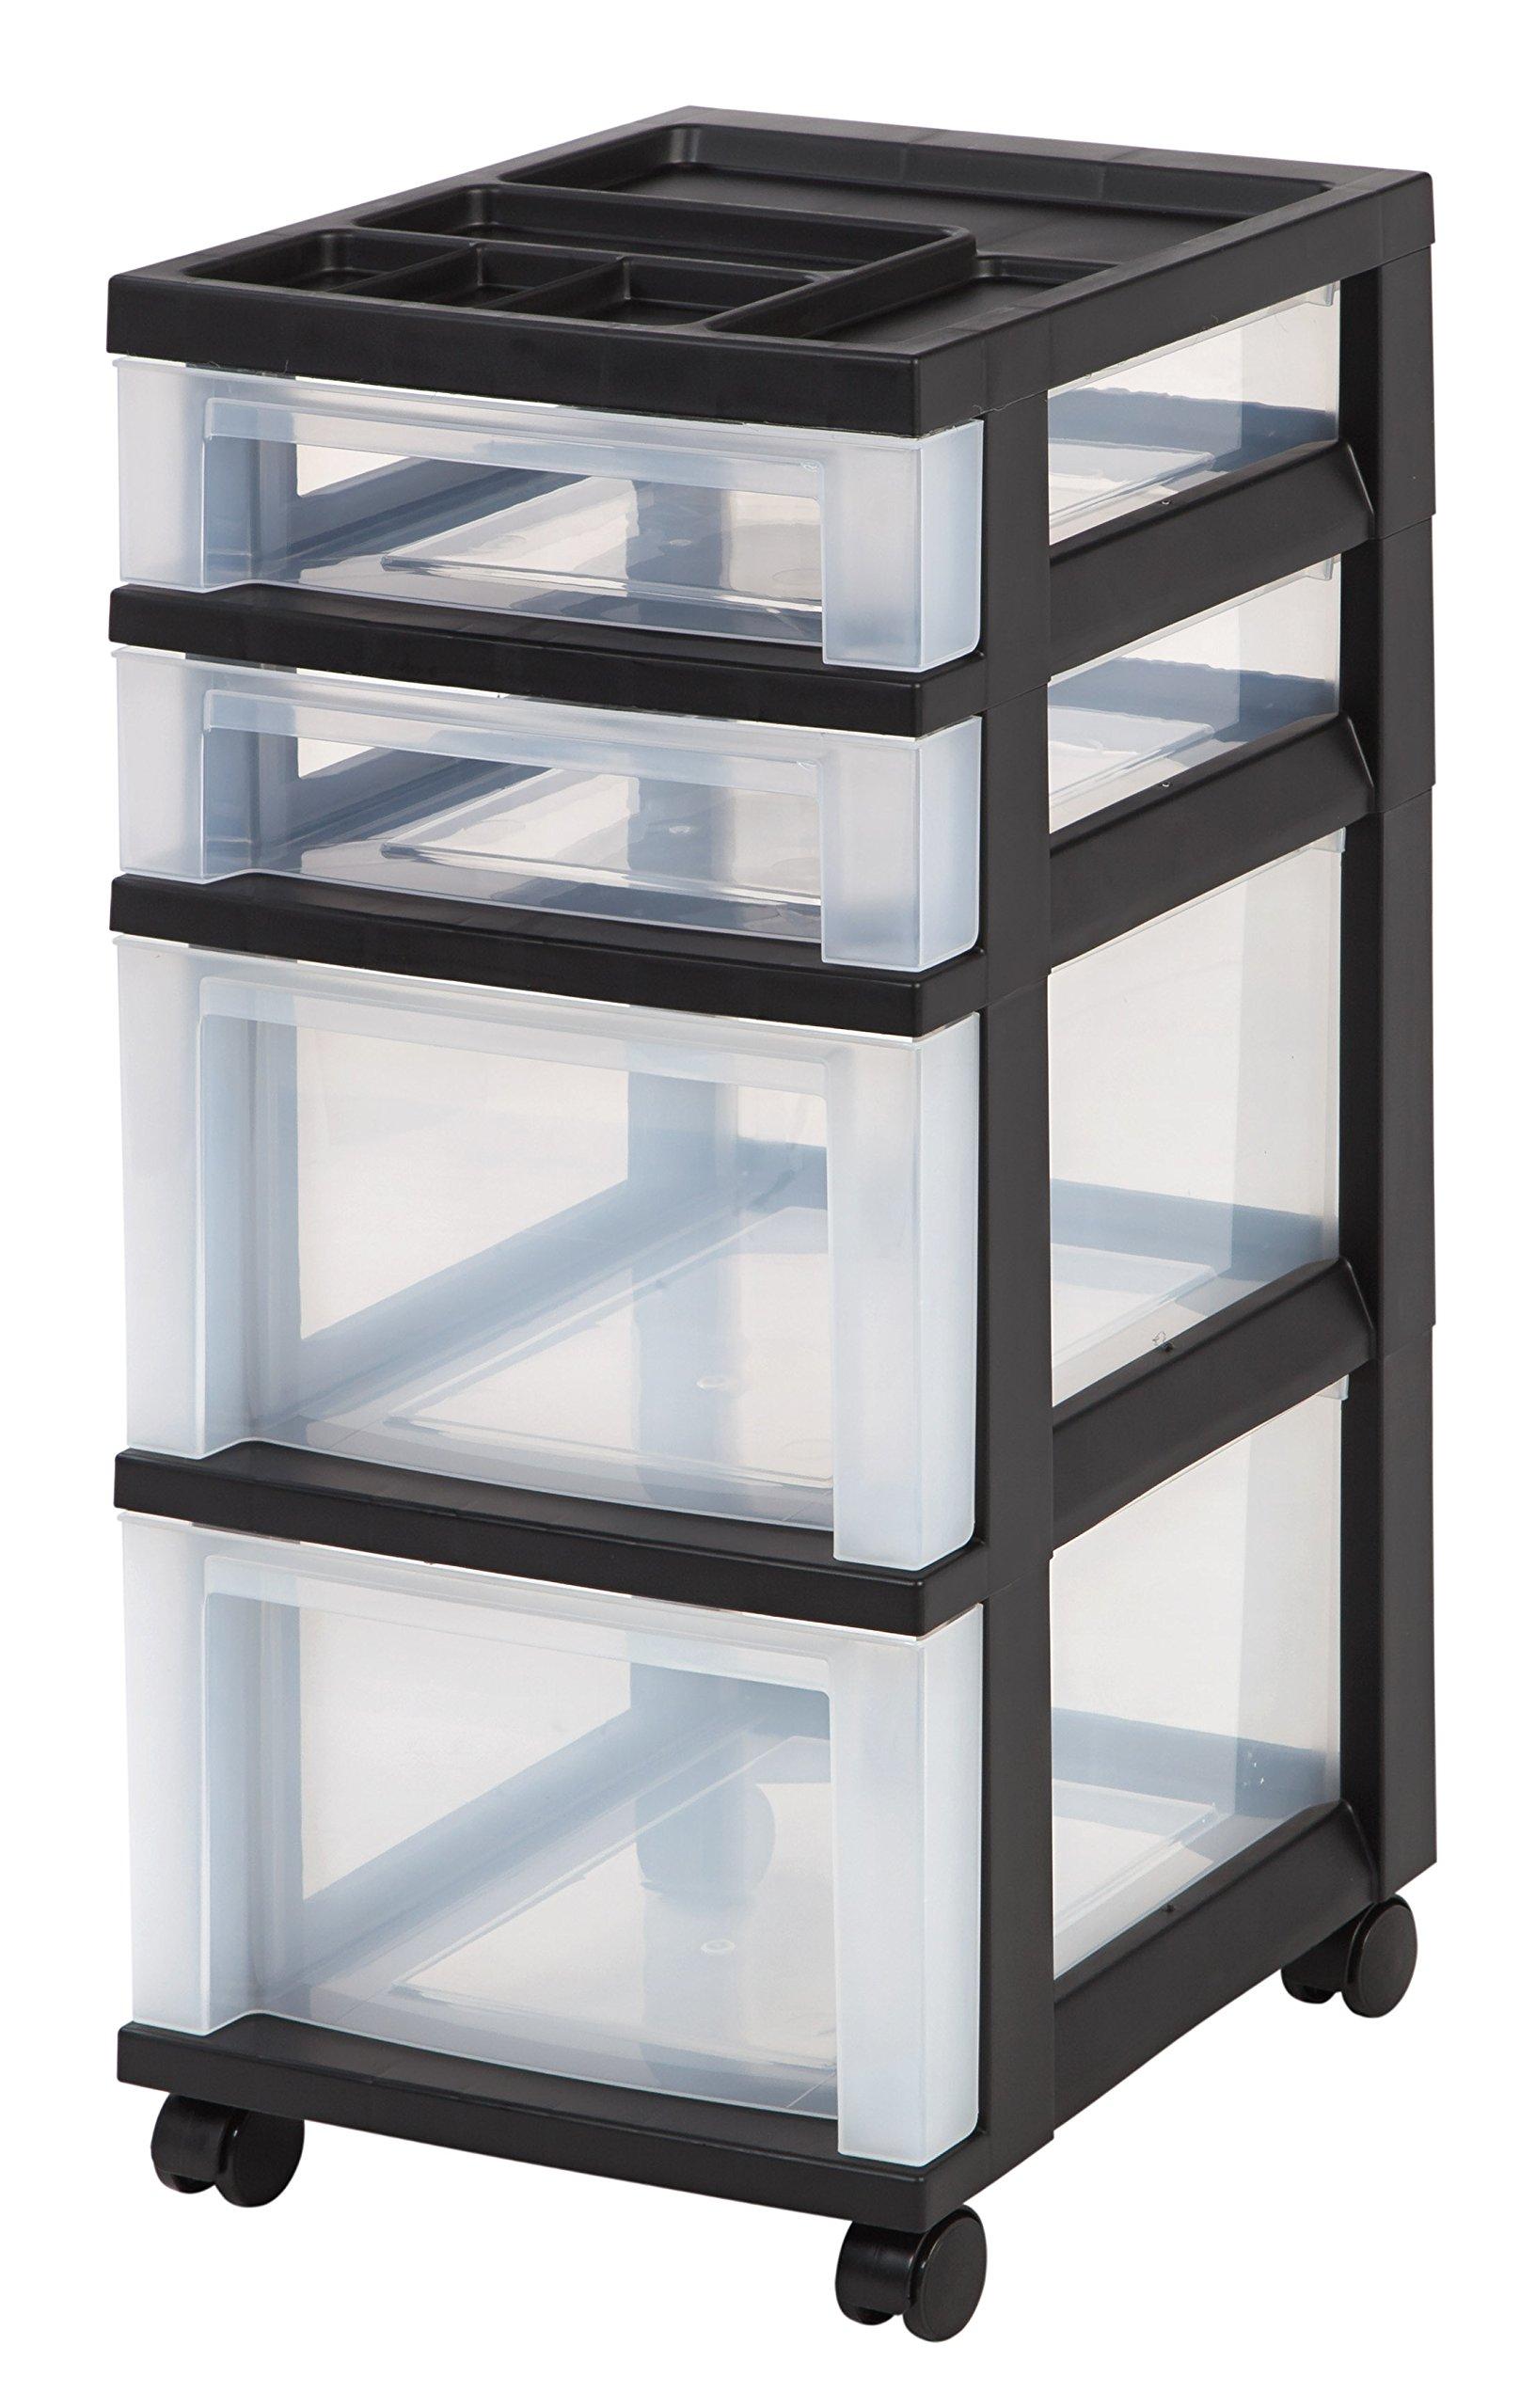 IRIS 4-Drawer Rolling Storage Cart with Organizer Top, Black by IRIS USA, Inc.